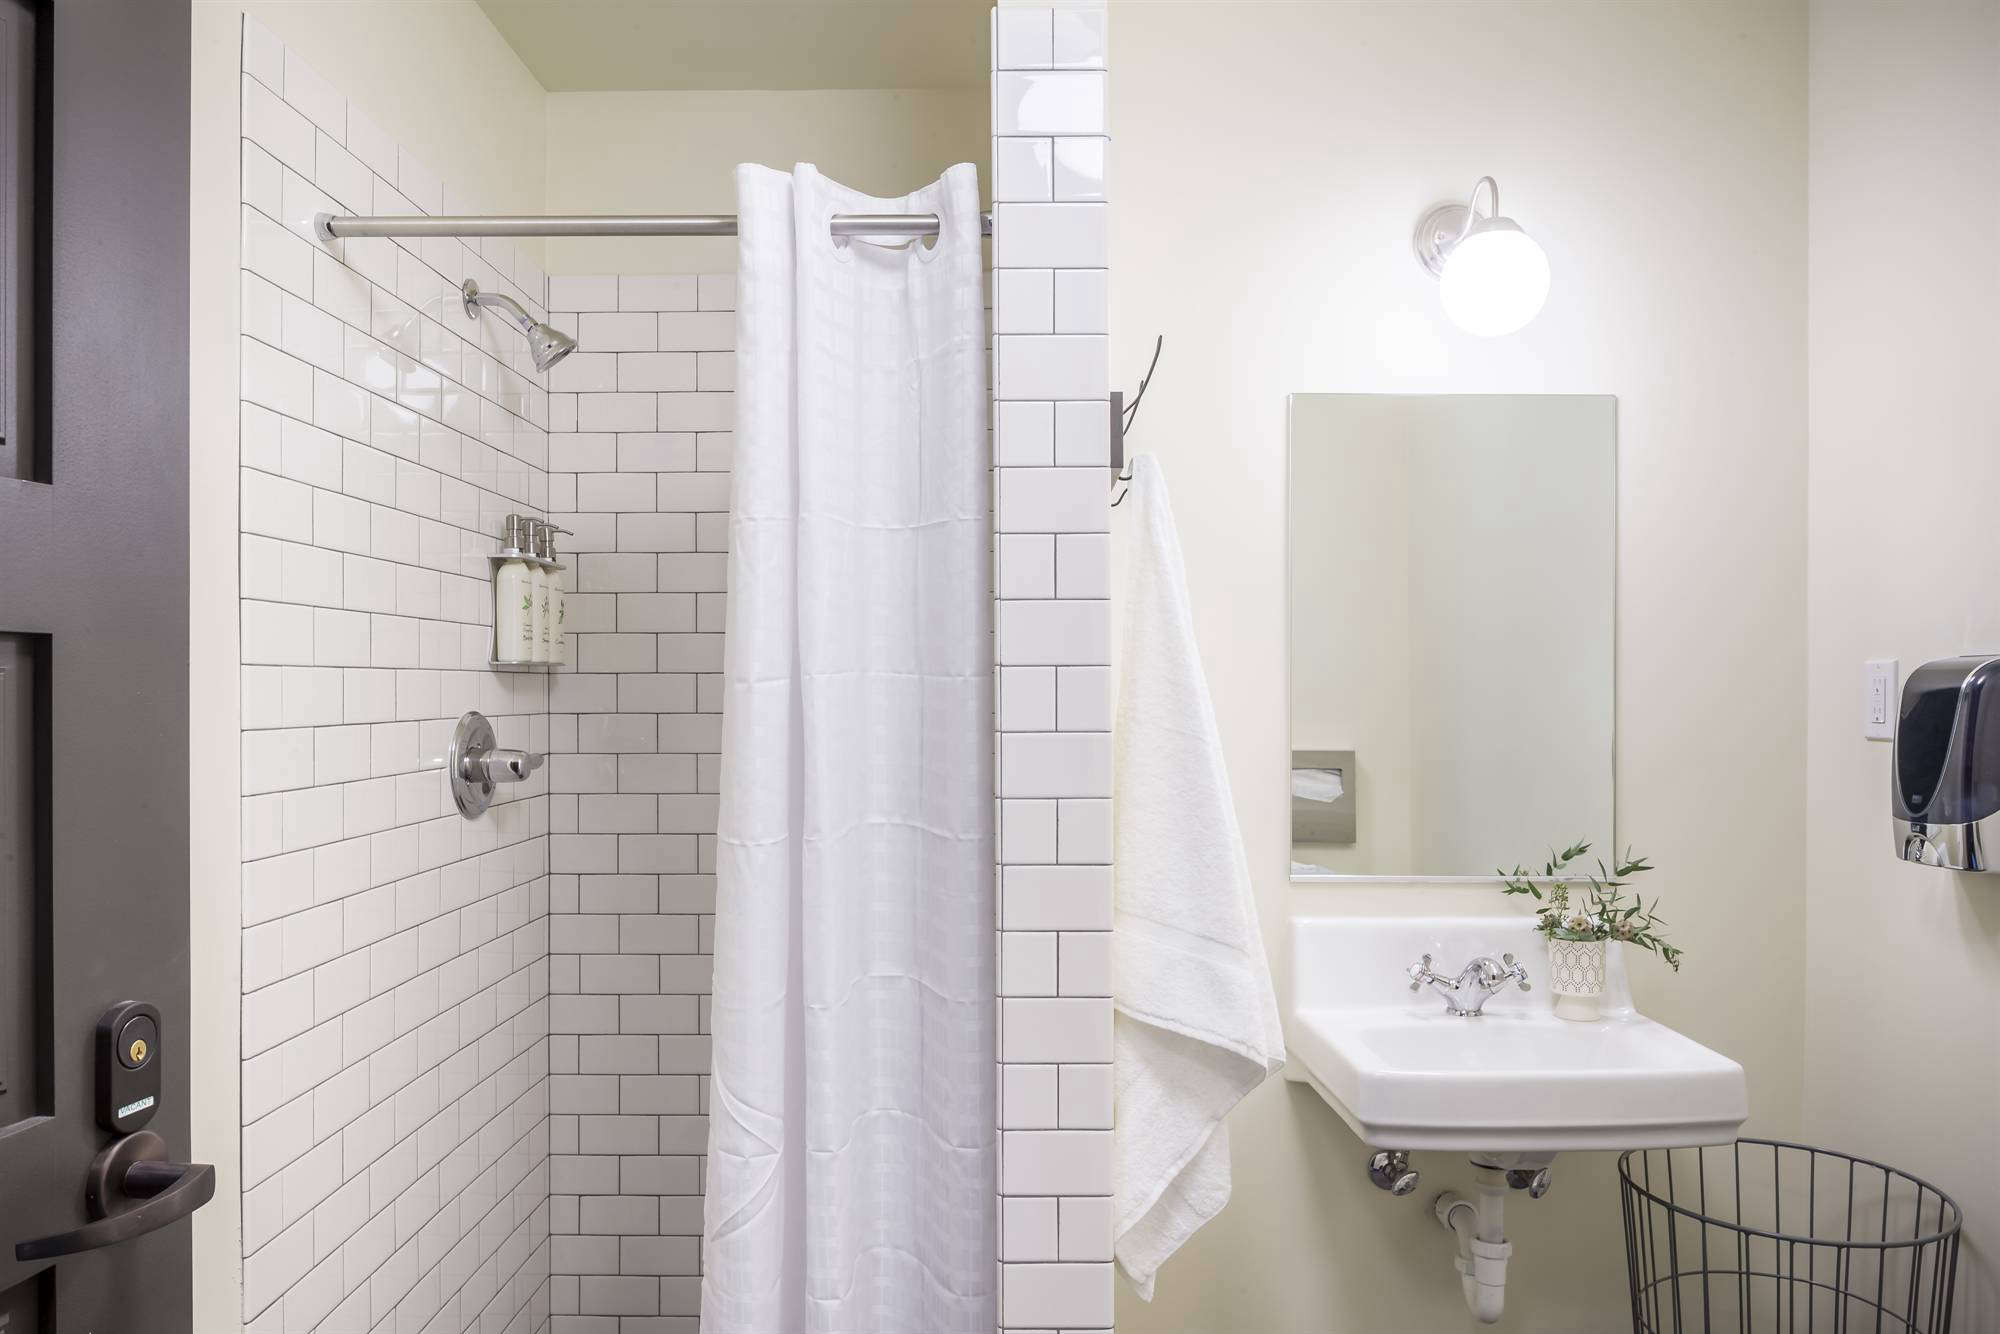 society hotel bathroom remodelista 12 17